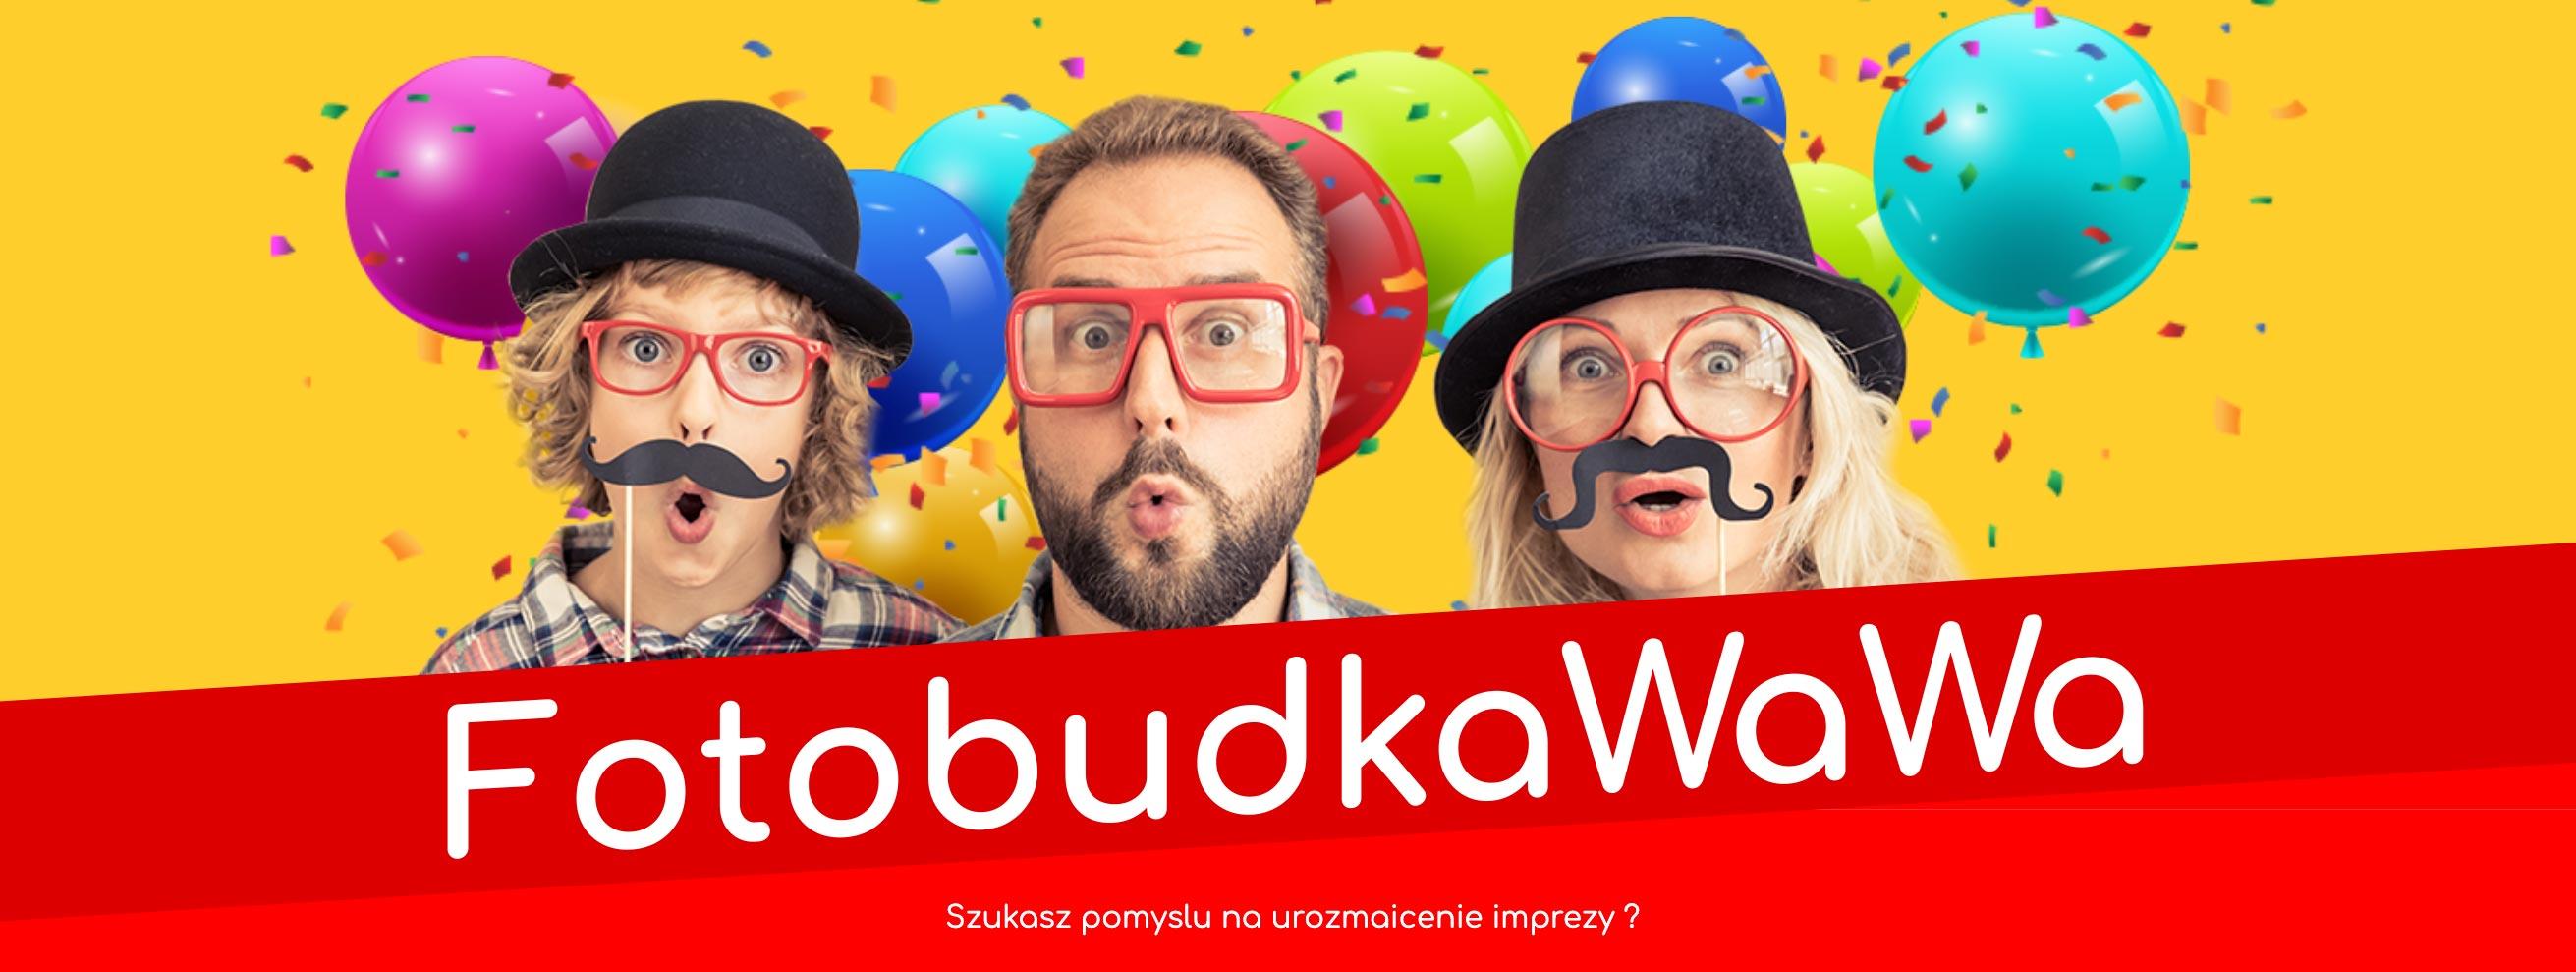 Fot0Budka Wawa